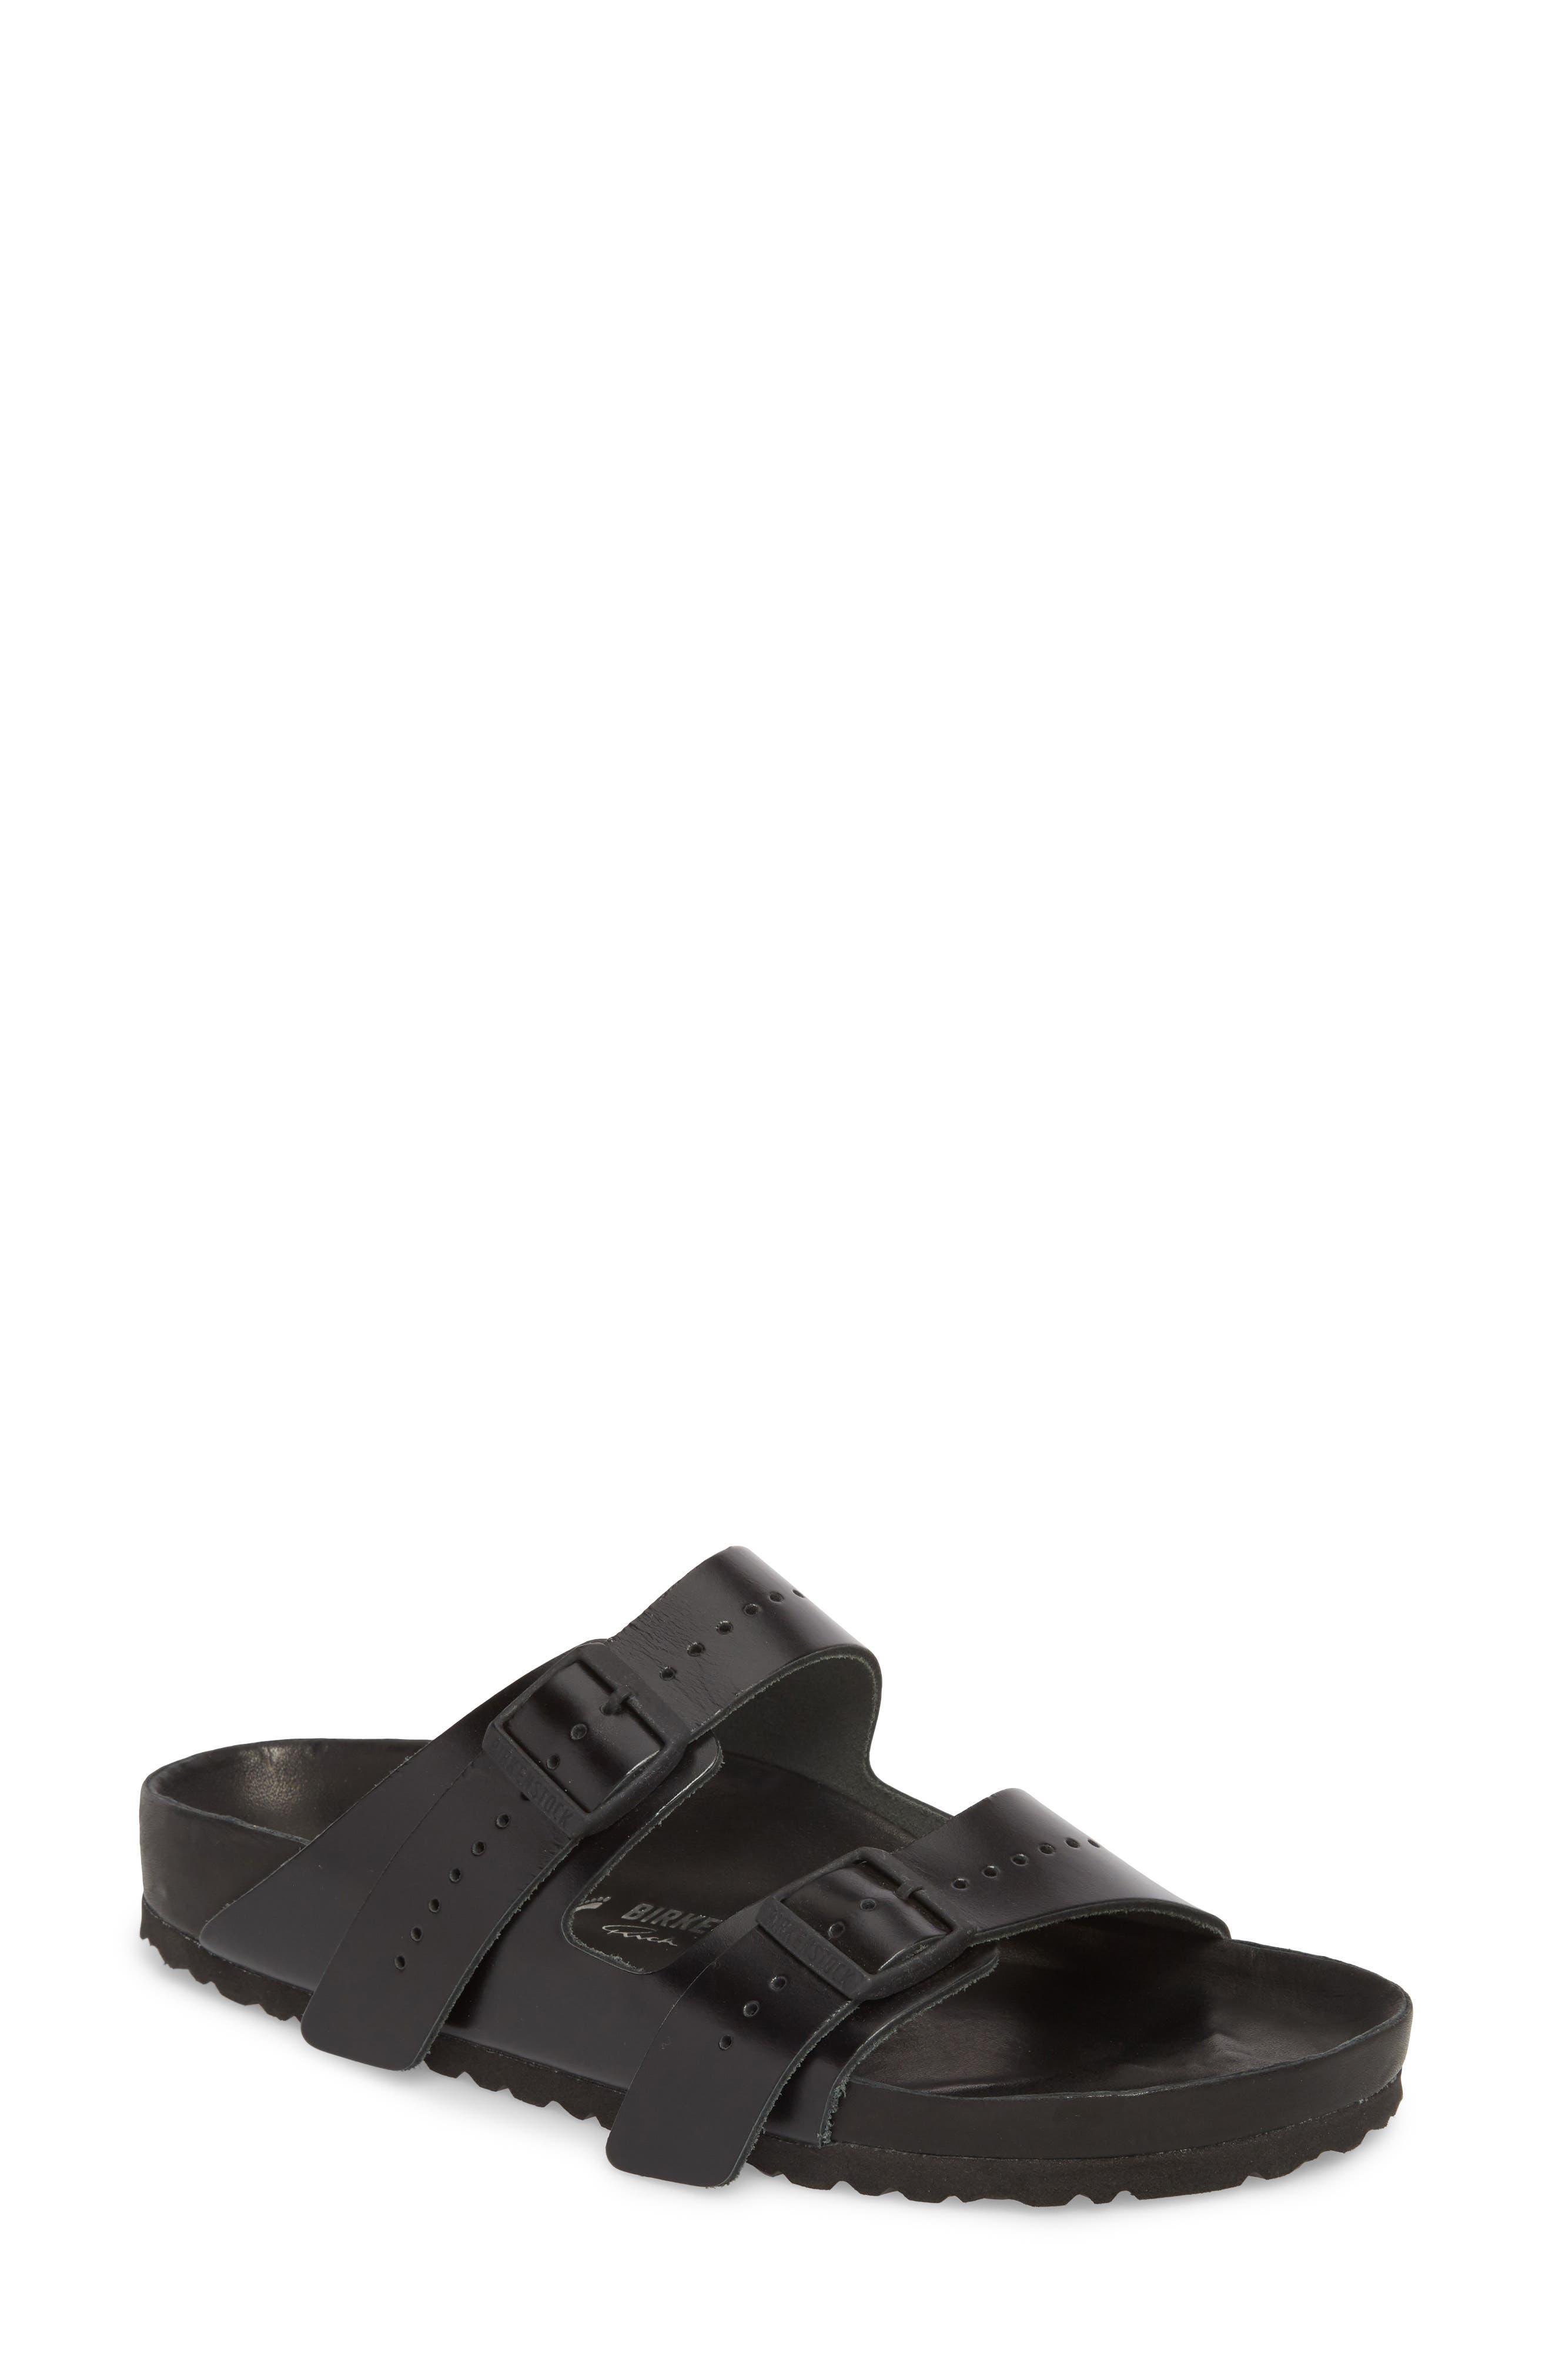 Rick Owens x Birkenstock Arizona Sandal,                         Main,                         color, BLACK/ BLACK